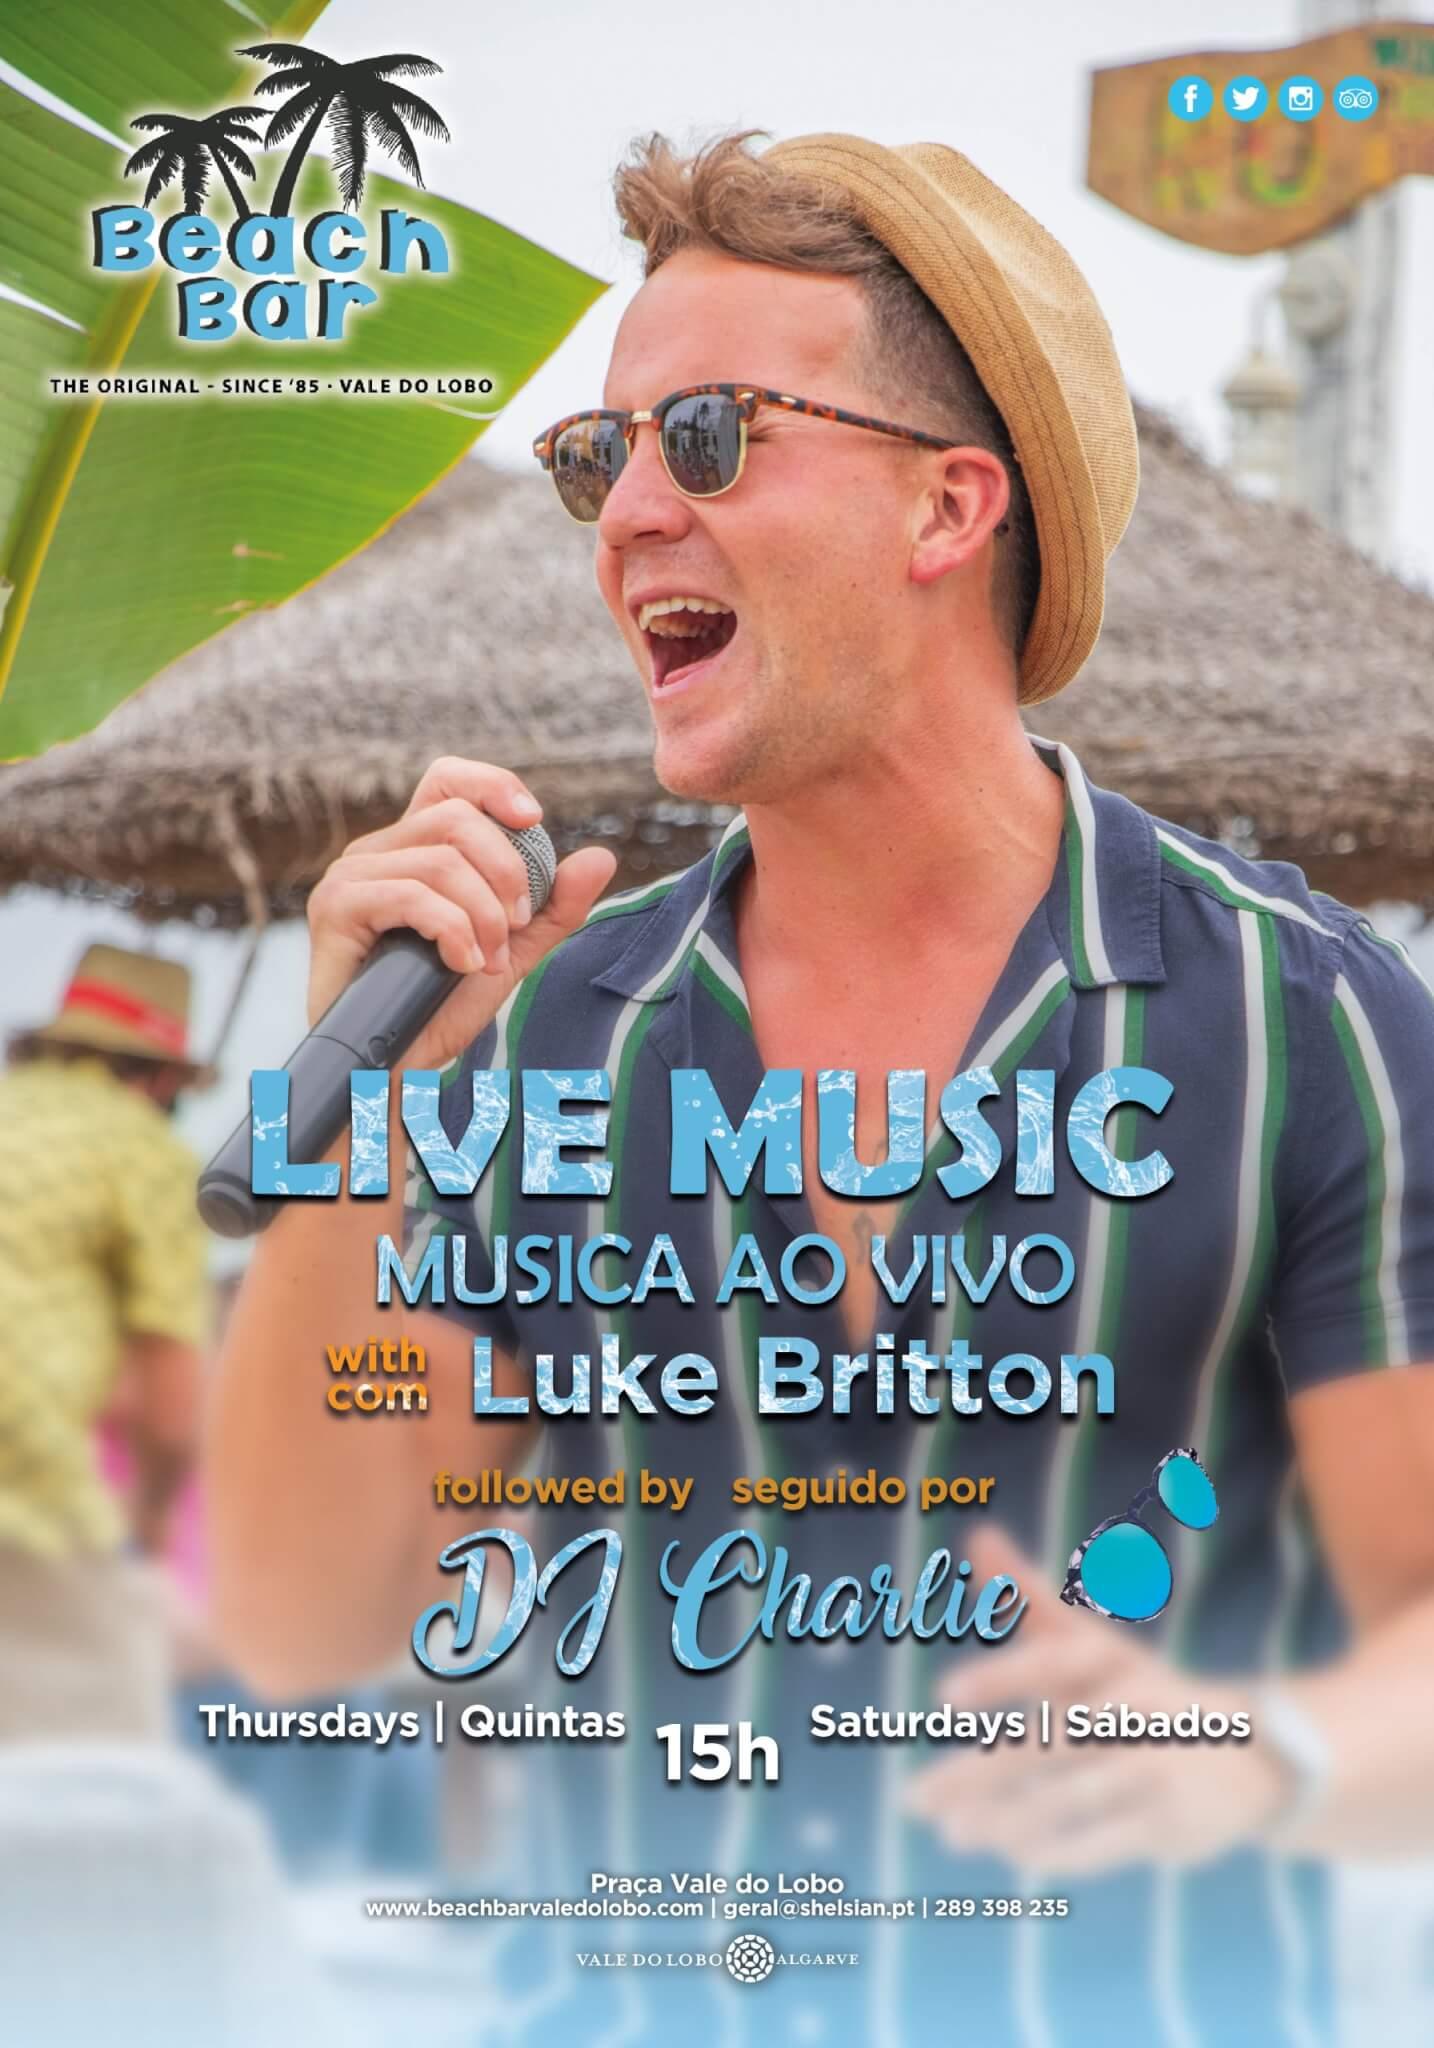 LIVE MUSIC WITH LUKE